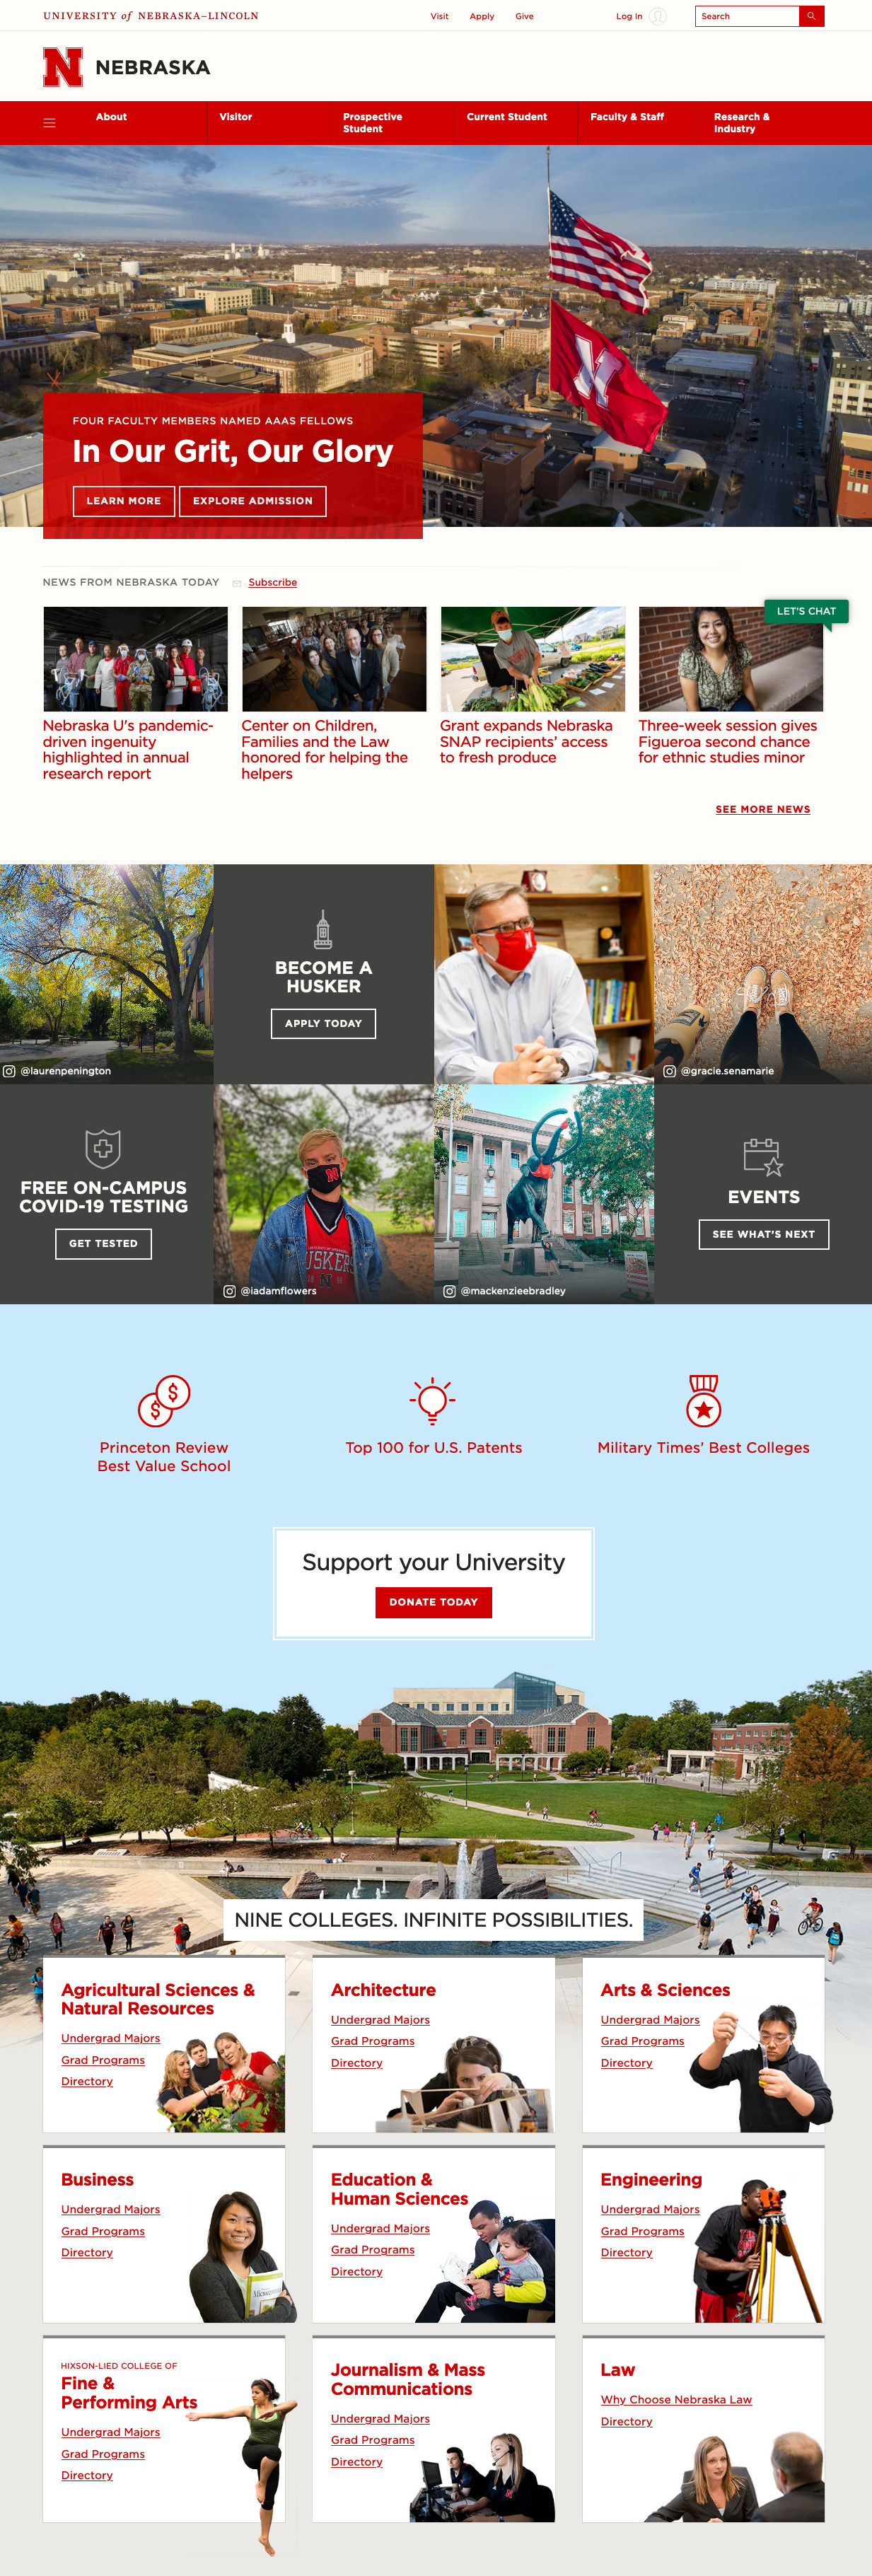 UNL Homepage